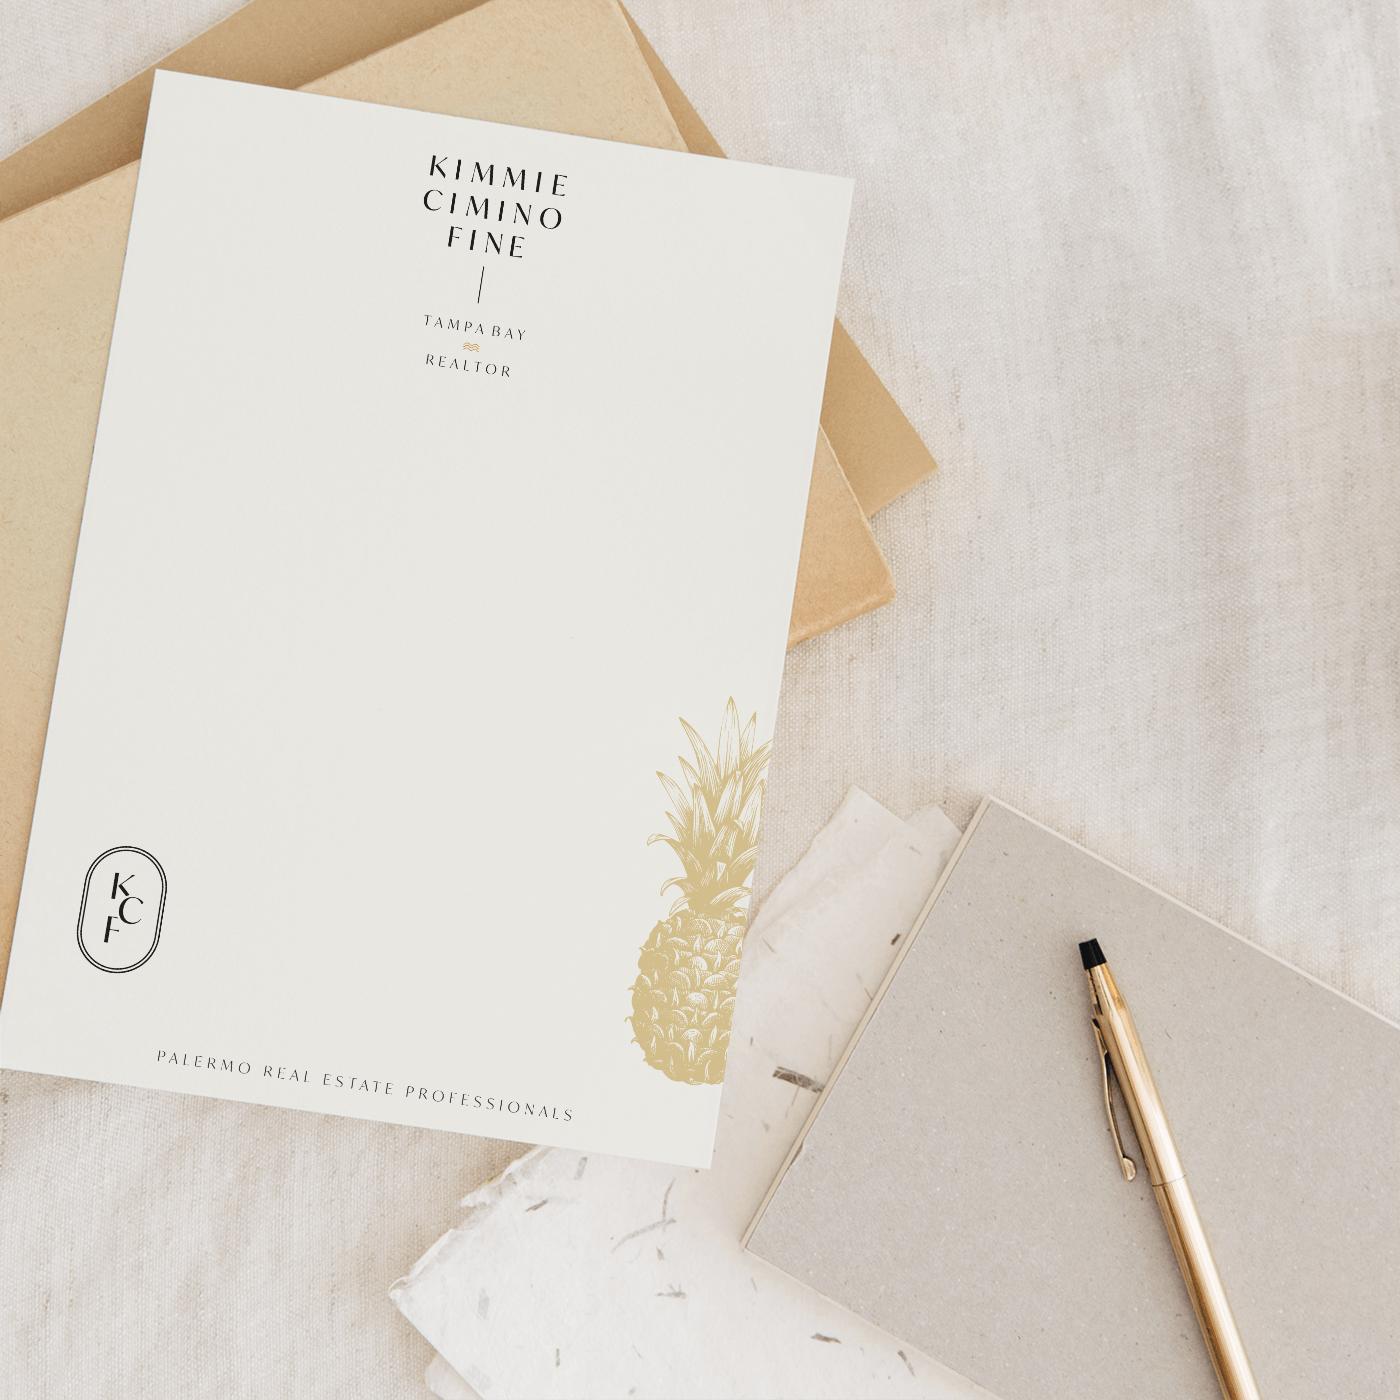 kimmie cimino fine realtor notecard design by Smith Design House